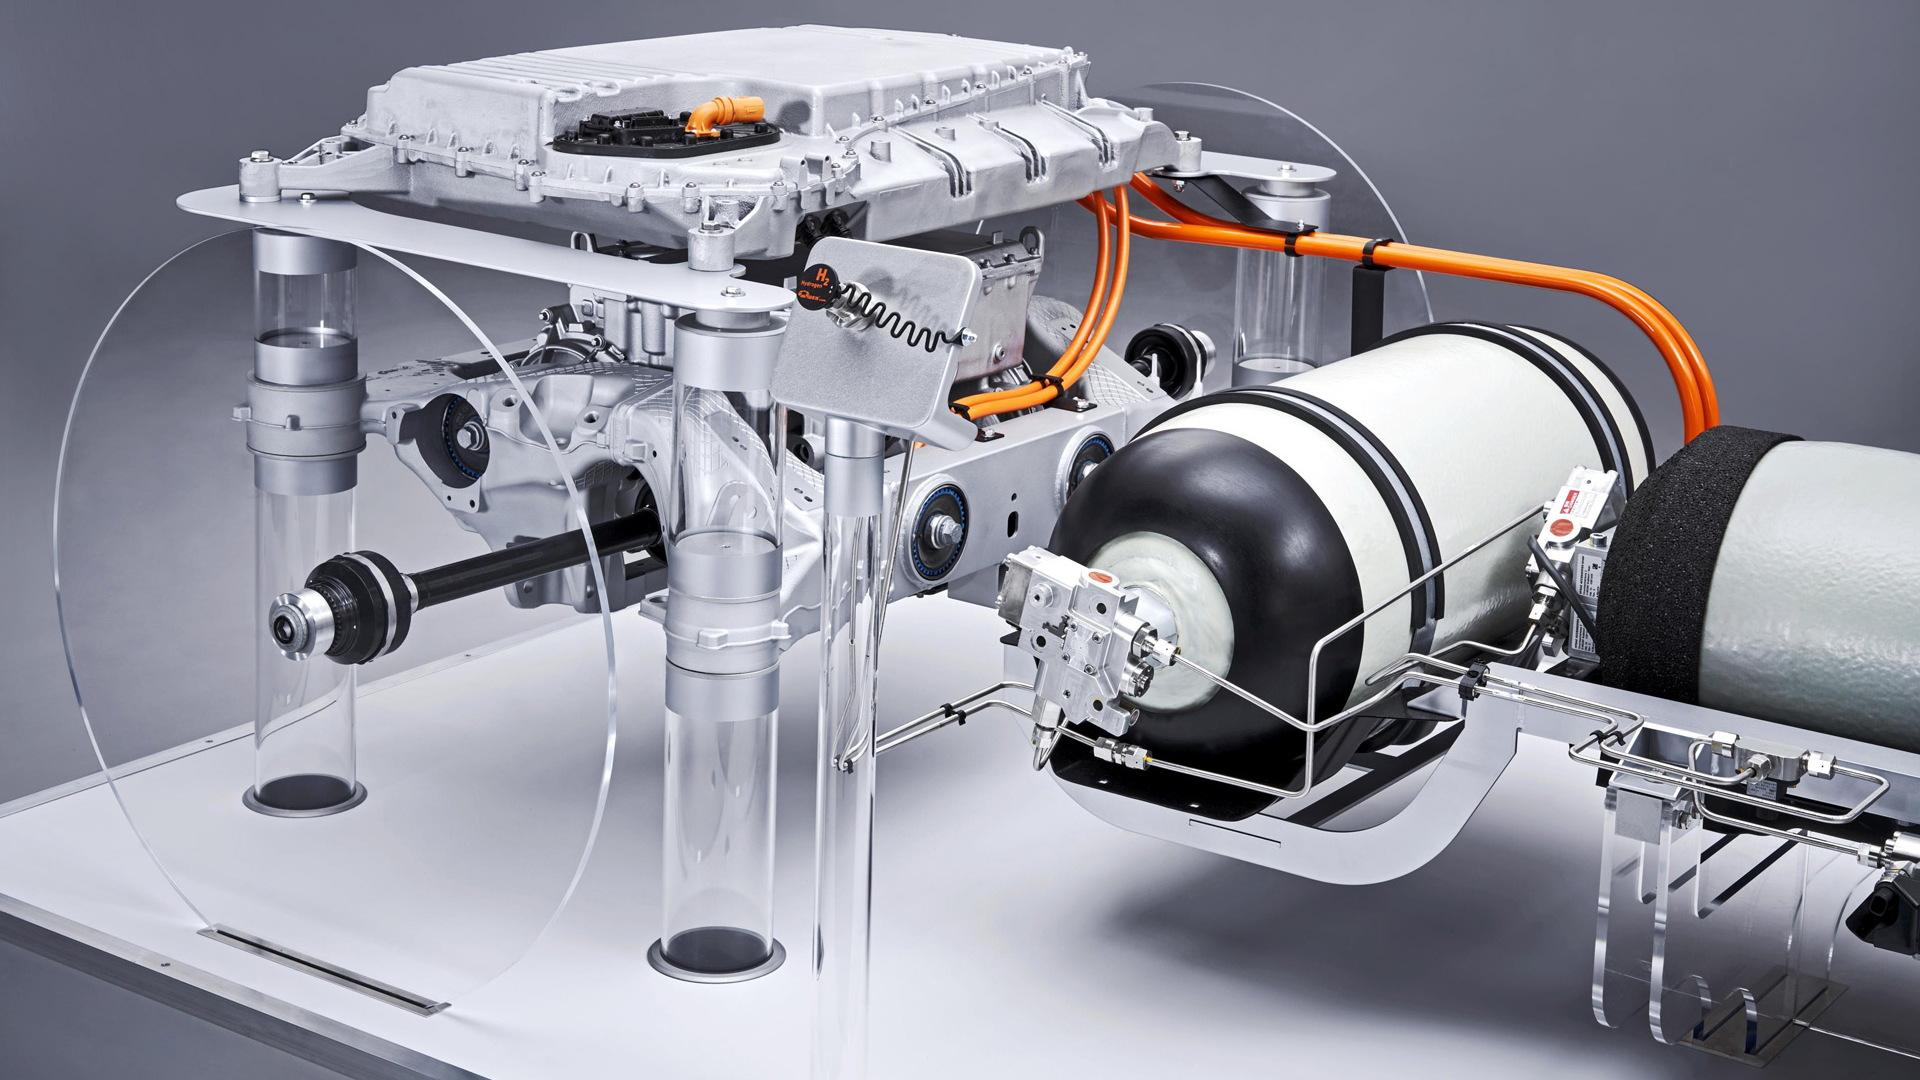 BMW hydrogen-electric powertrain entering production in 2022